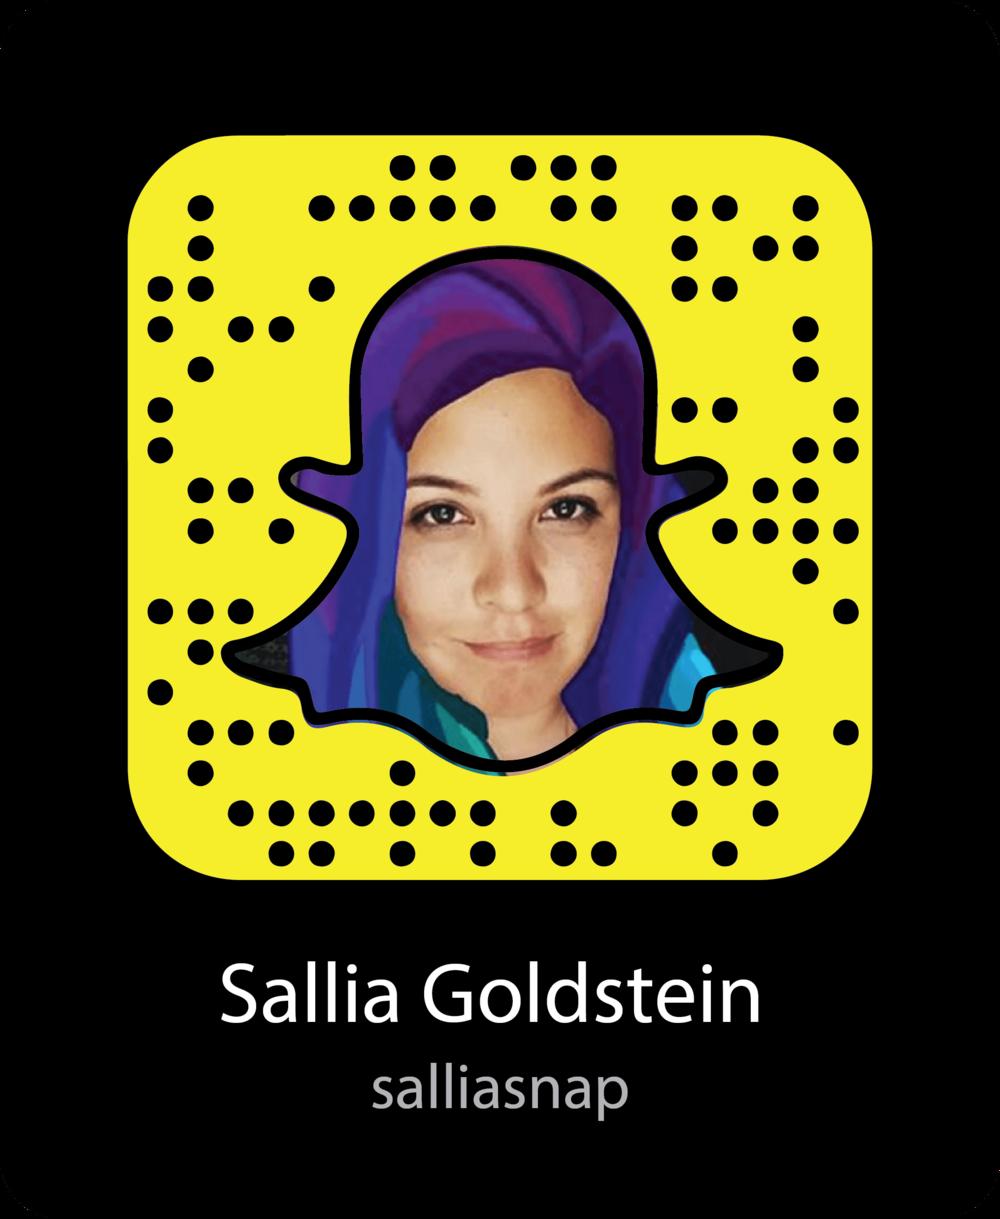 sallia-goldstein-artists-snapchat-snapcode